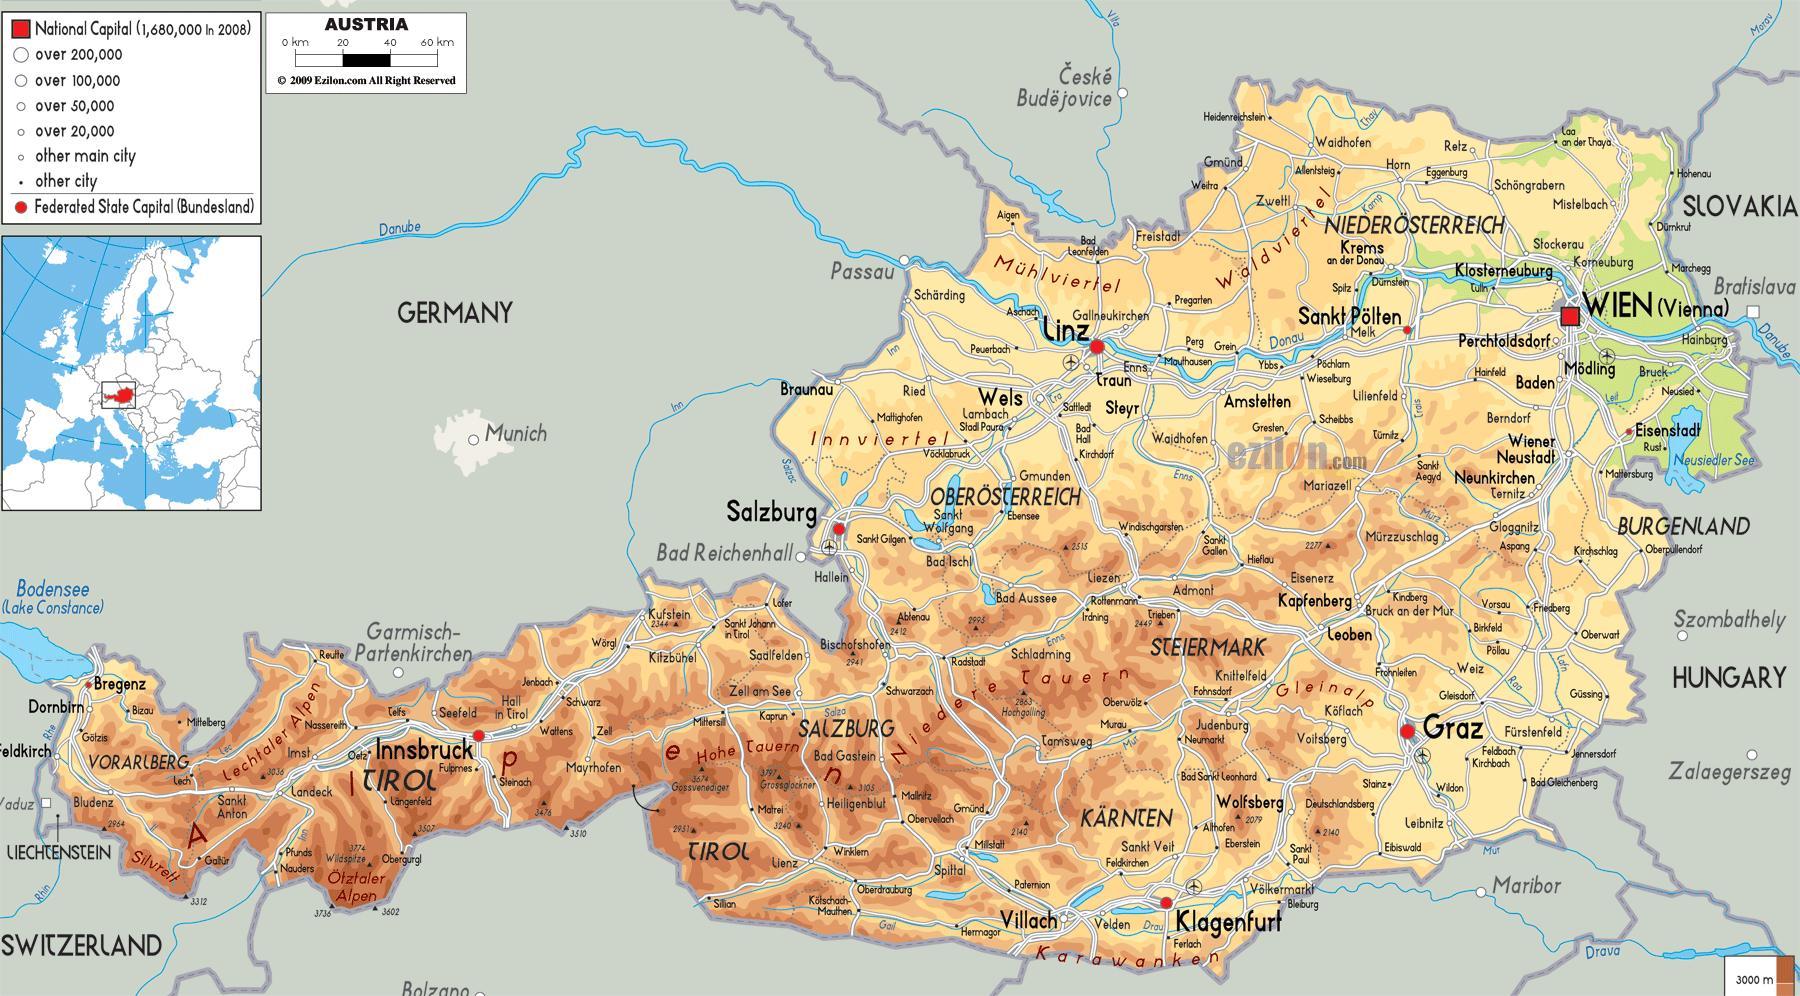 Austrian alps map - Austria mountains map (Western Europe - Europe)